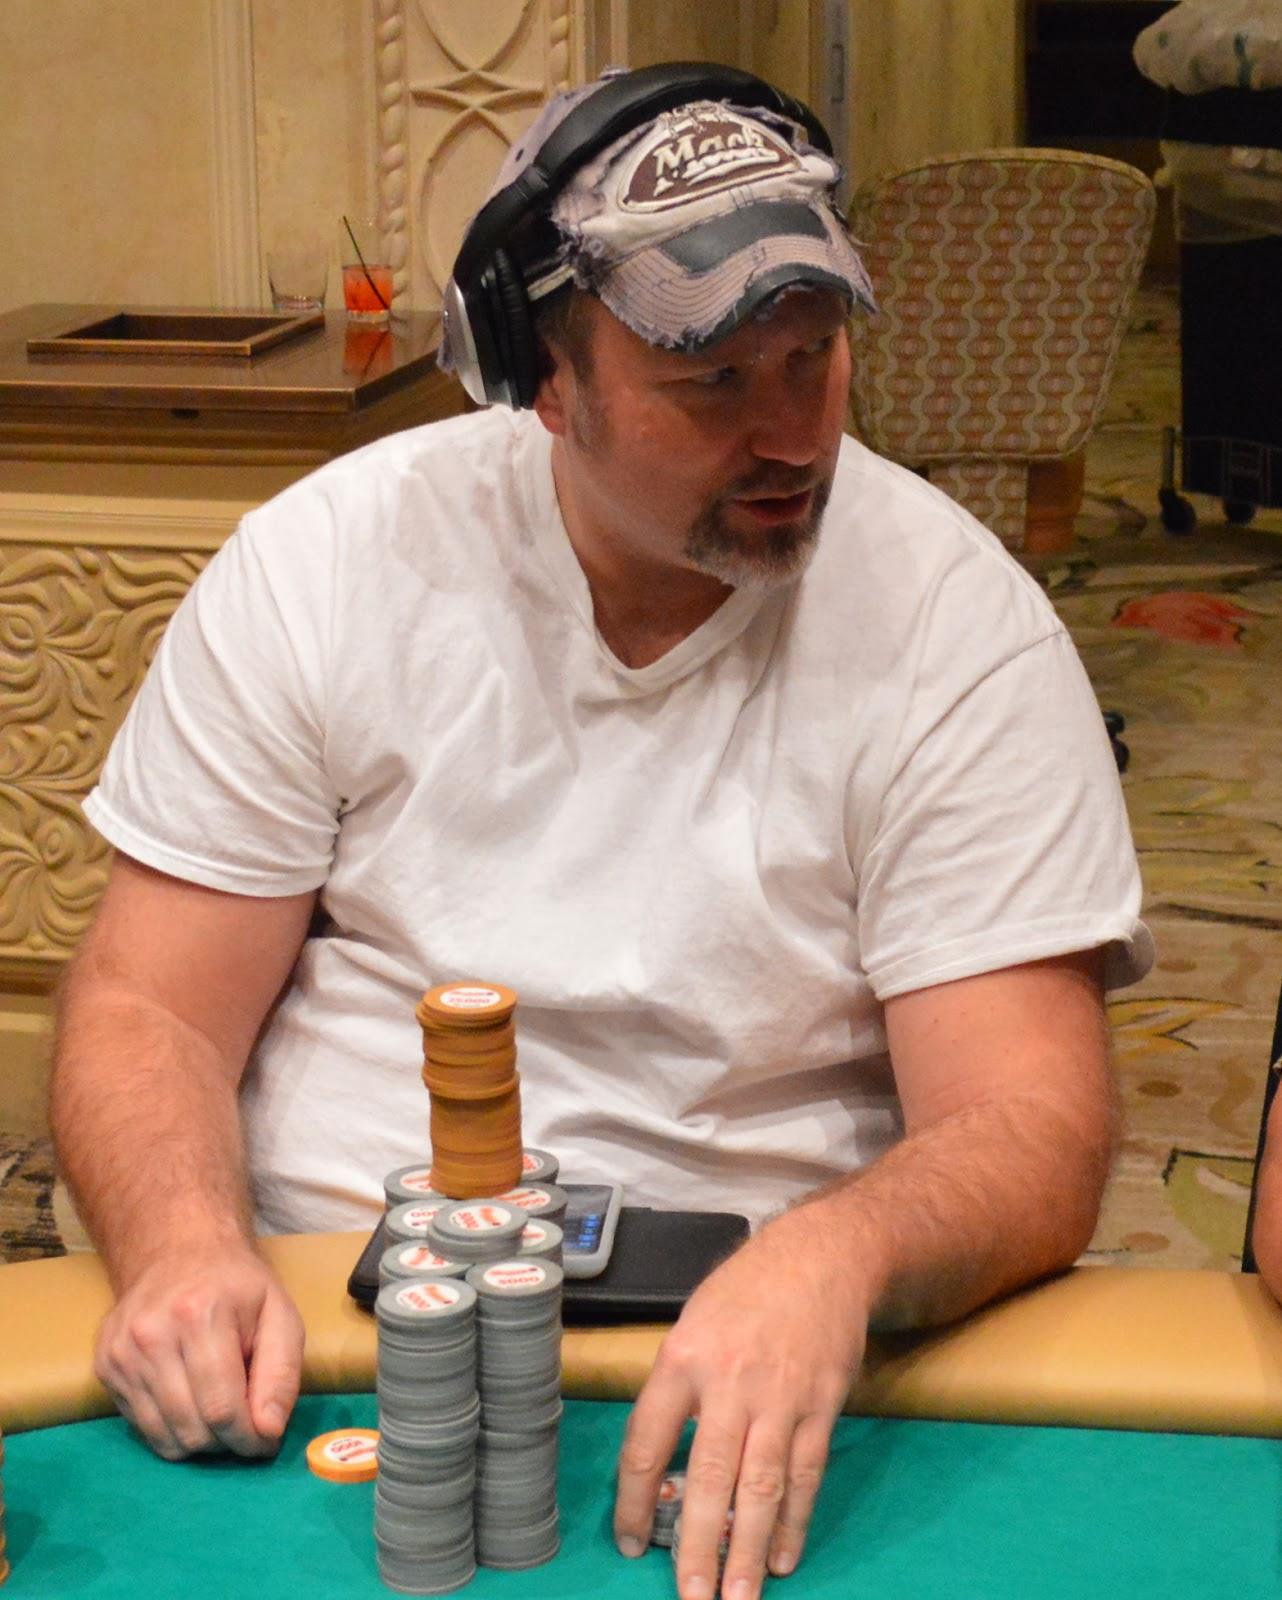 Borgata Fall Poker Open 2013 11 19 13